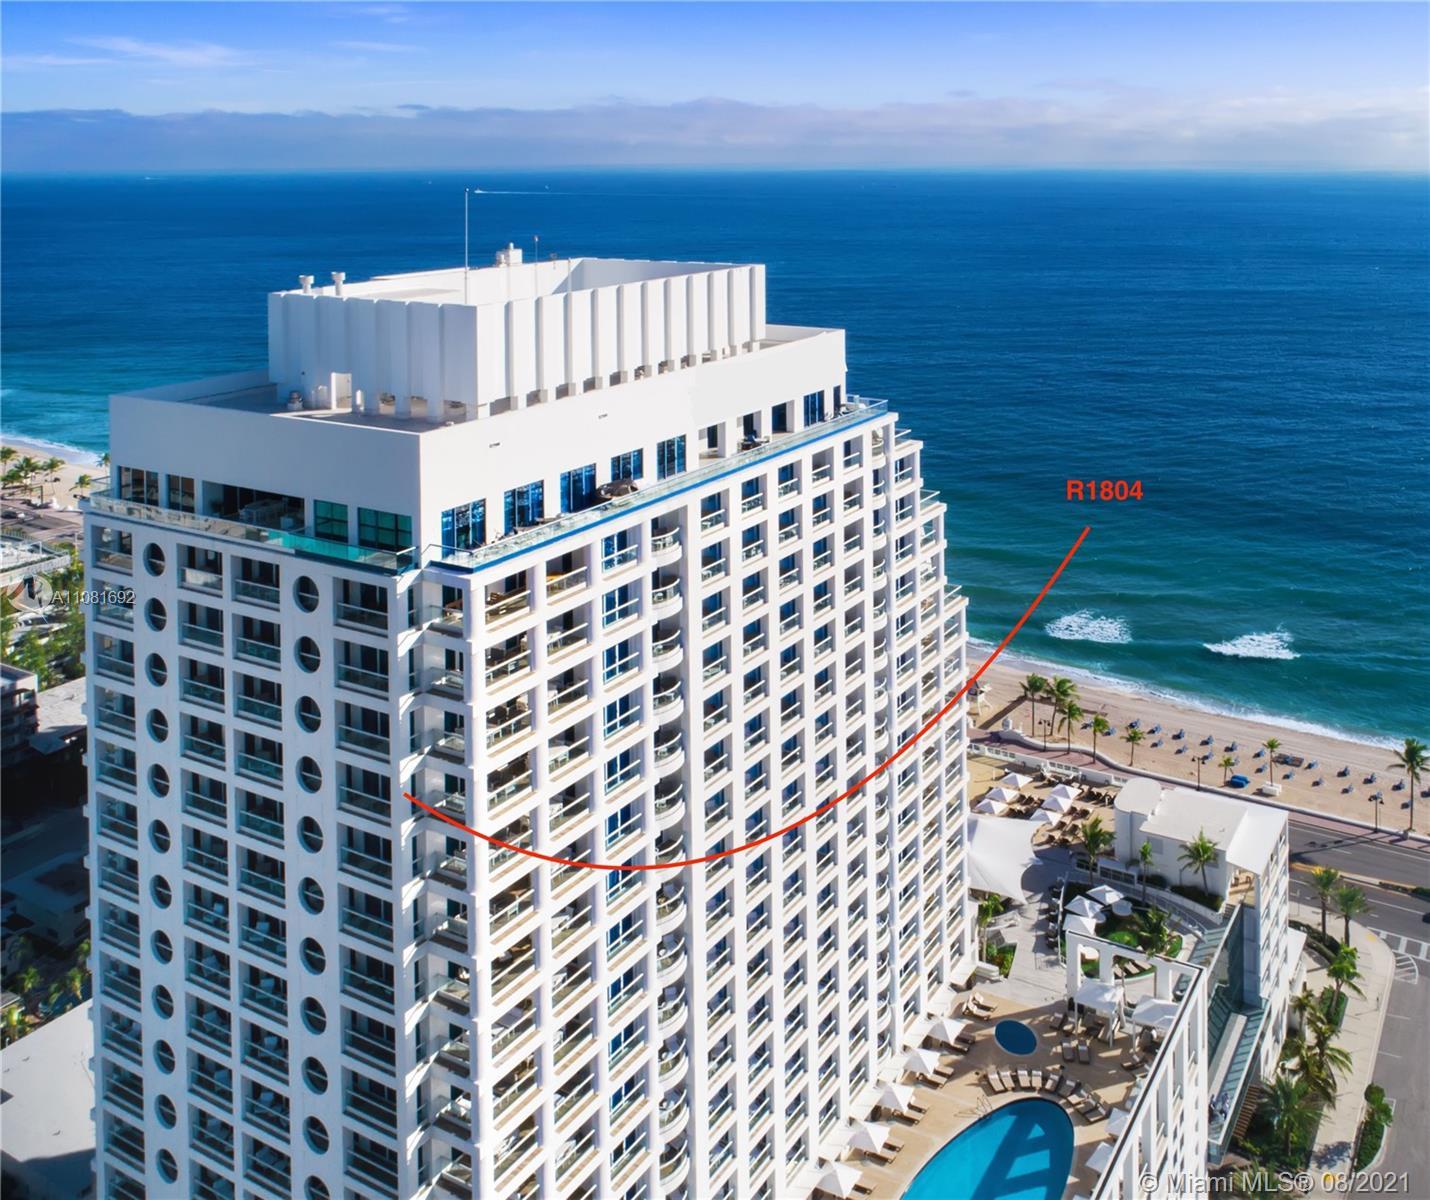 551 N Fort Lauderdale Beach Blvd #R1804 photo01